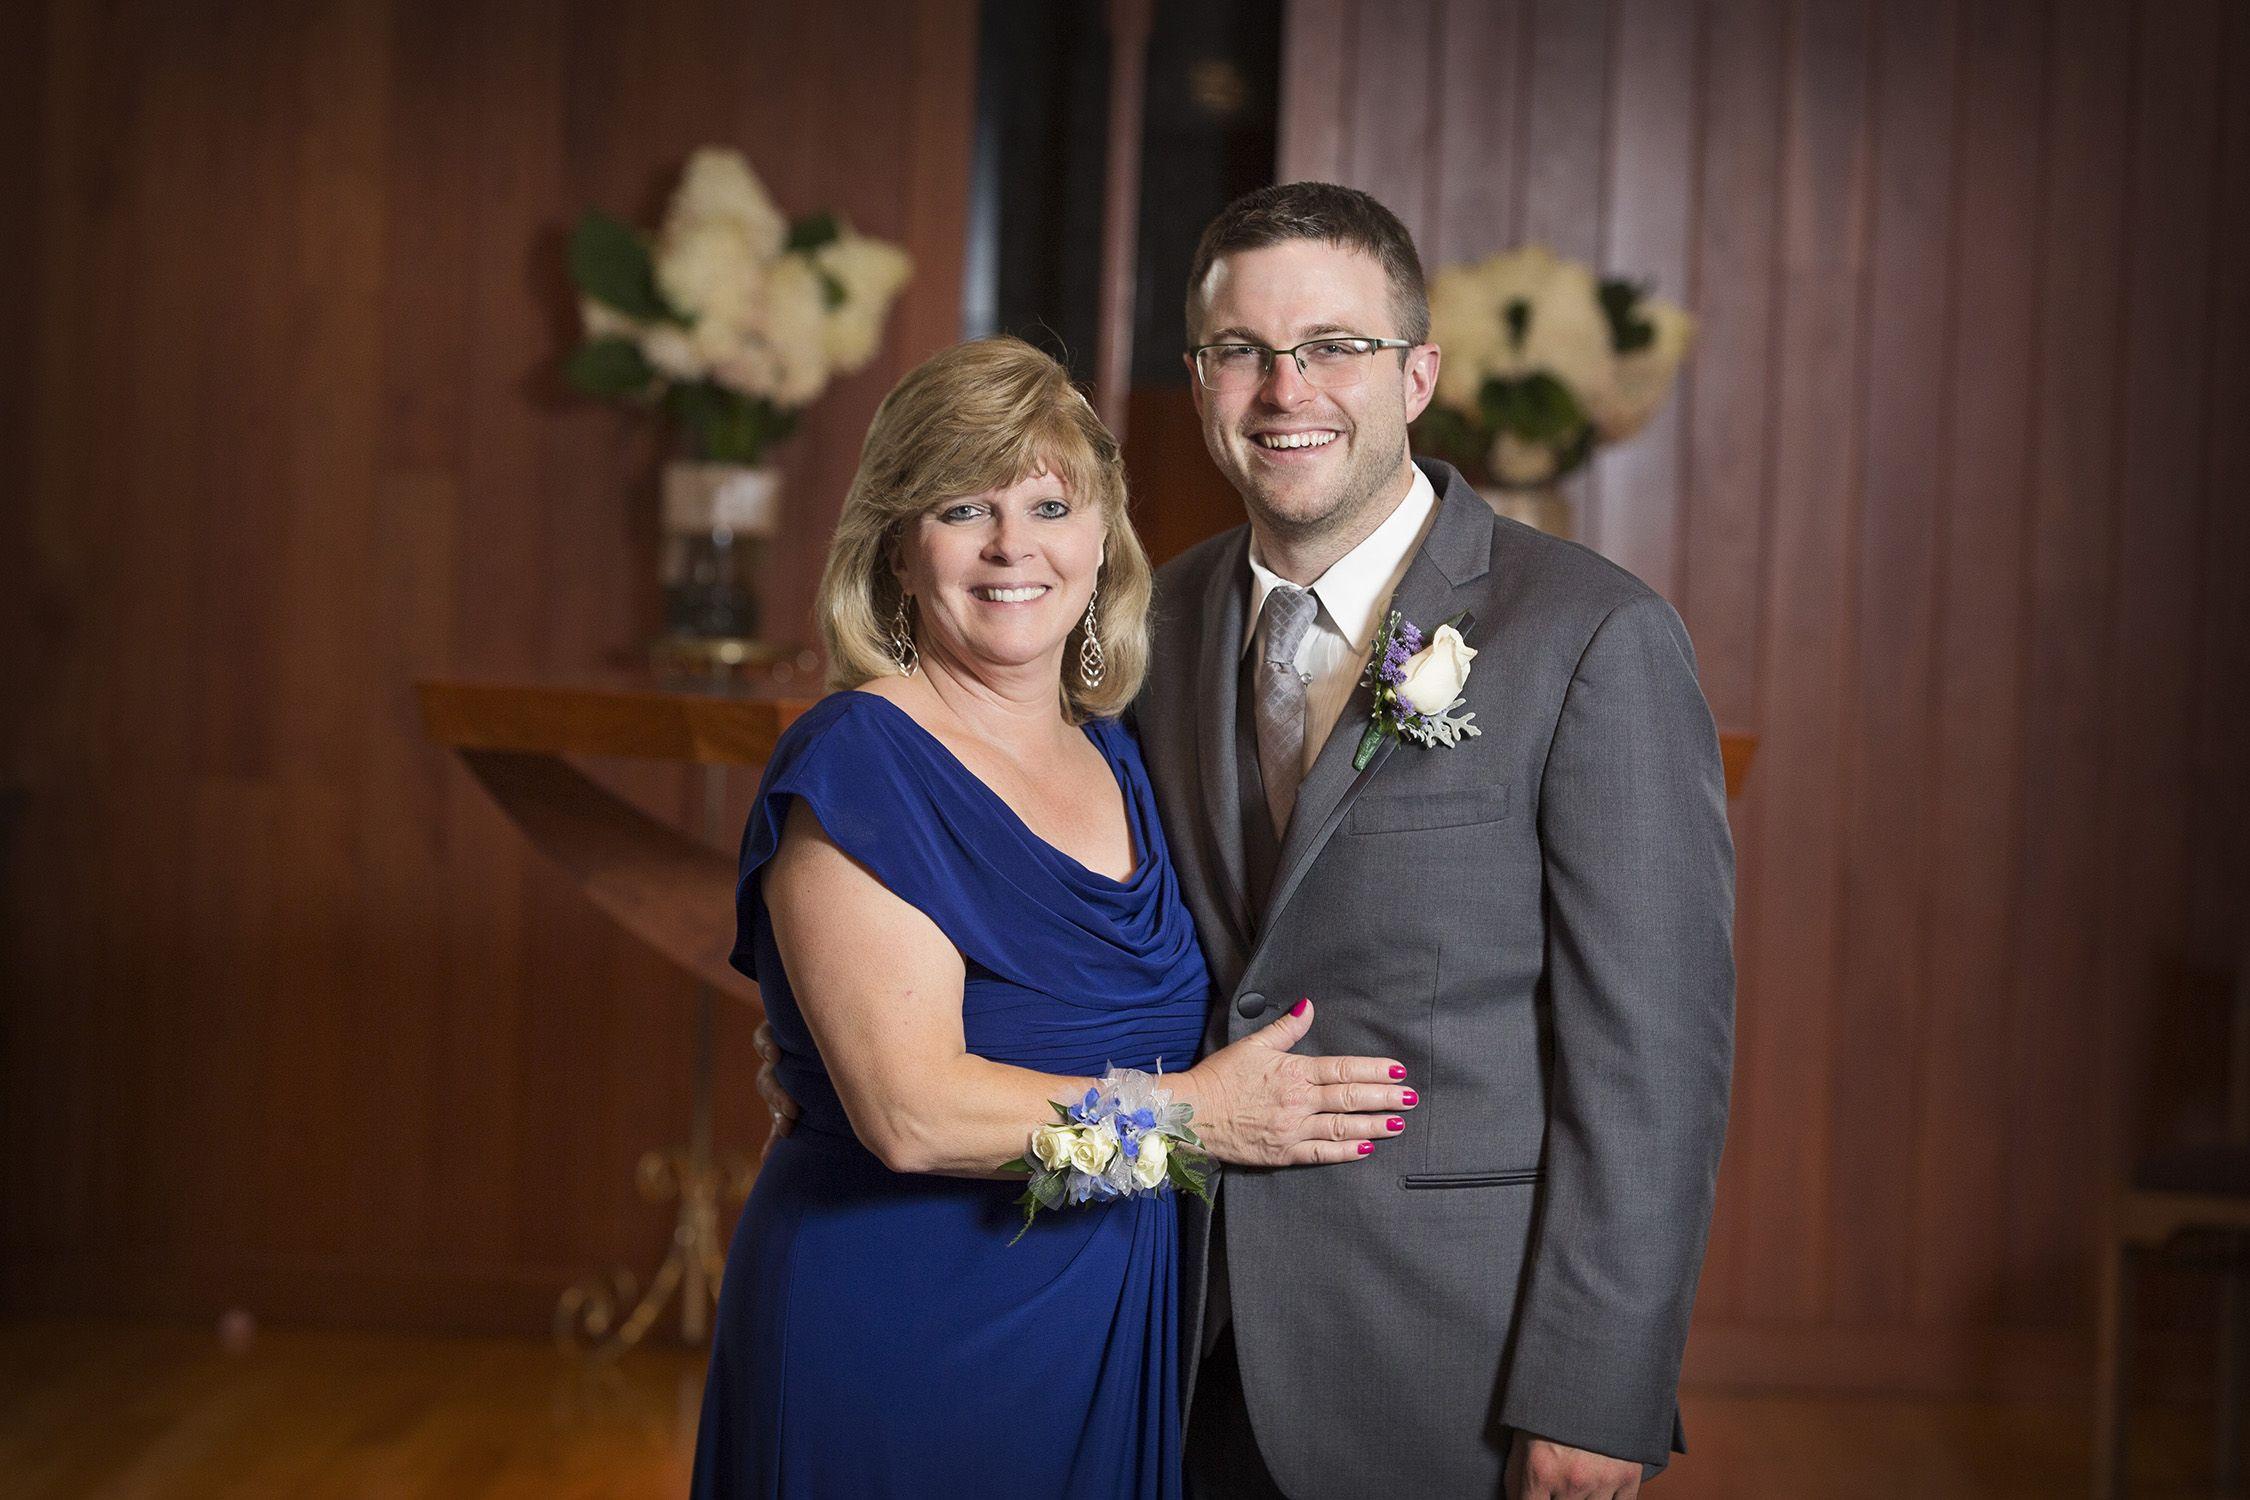 Corsage + Boutonniere   Corsage, Bridesmaid dresses, Wedding